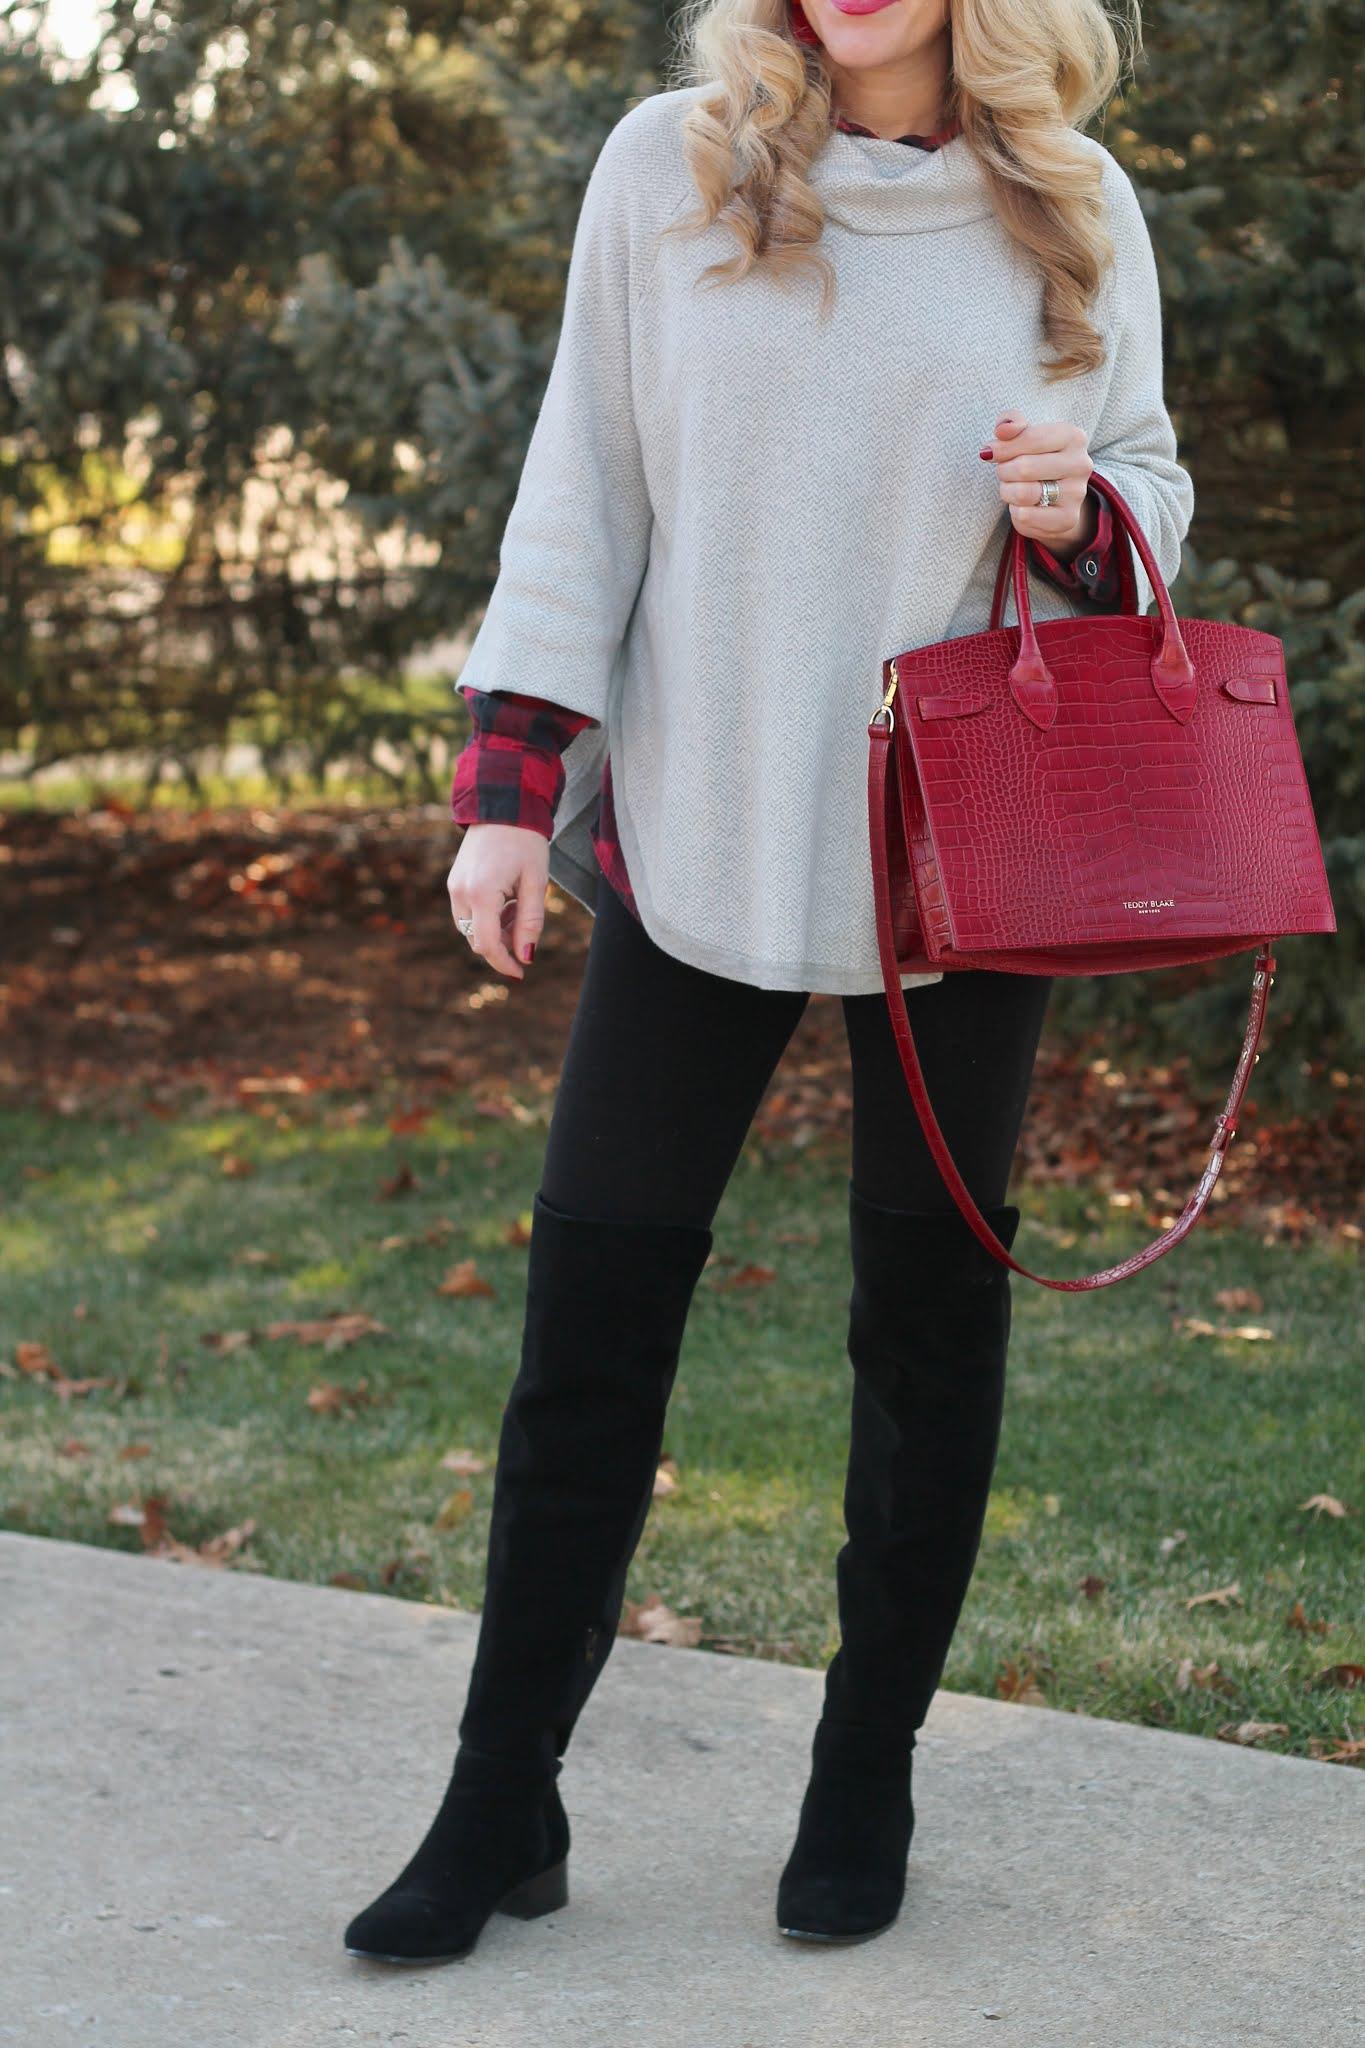 winter layered outfit, red buffalo plaid button up, aventura sonata grey poncho, OTK black boots, burgundy teddy blake bag, black leggings